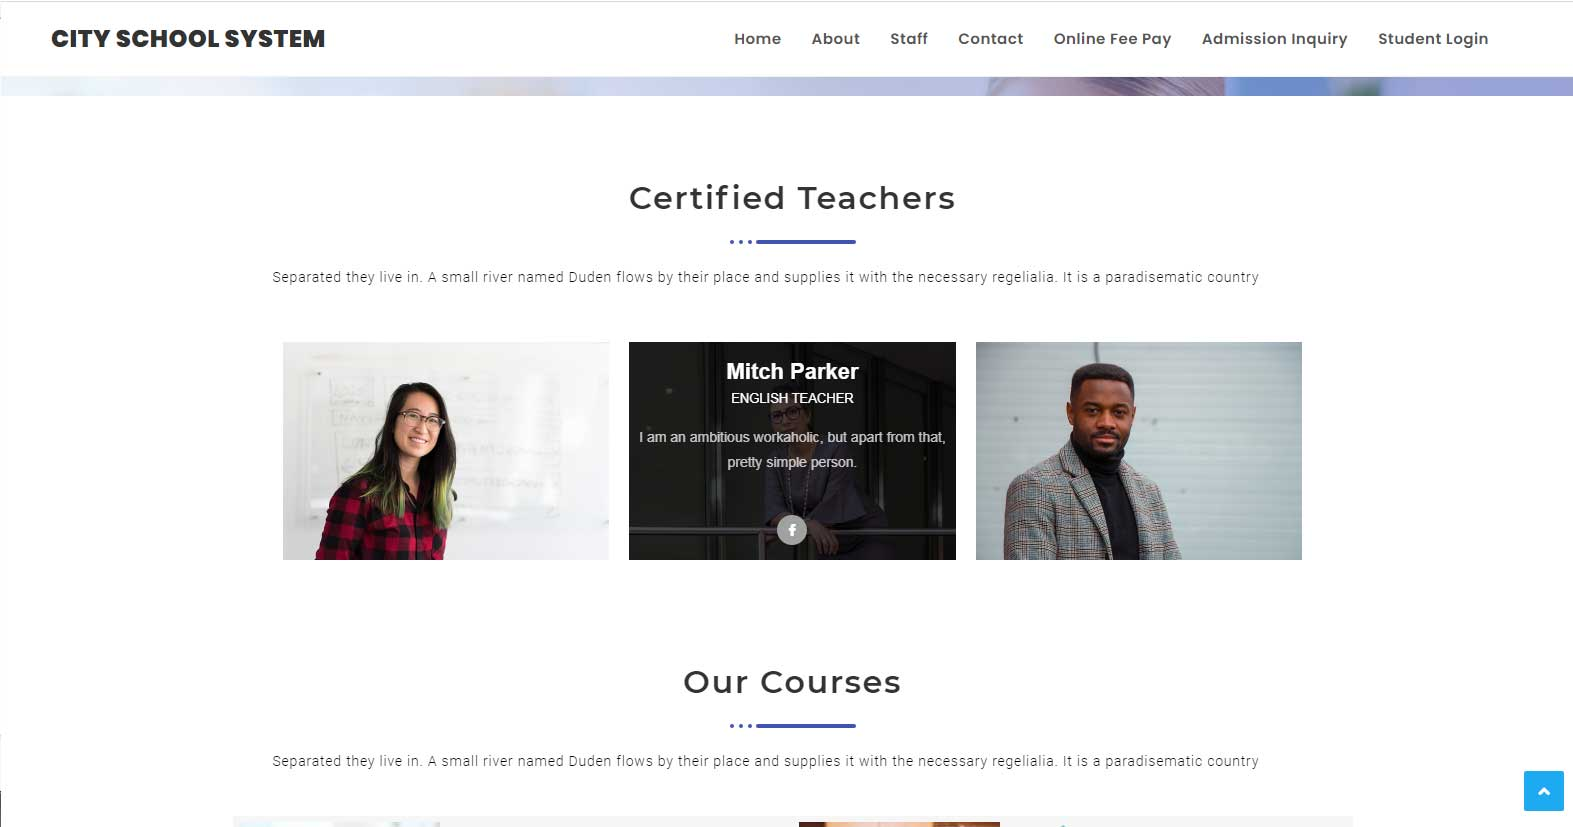 City-School-System-teachers